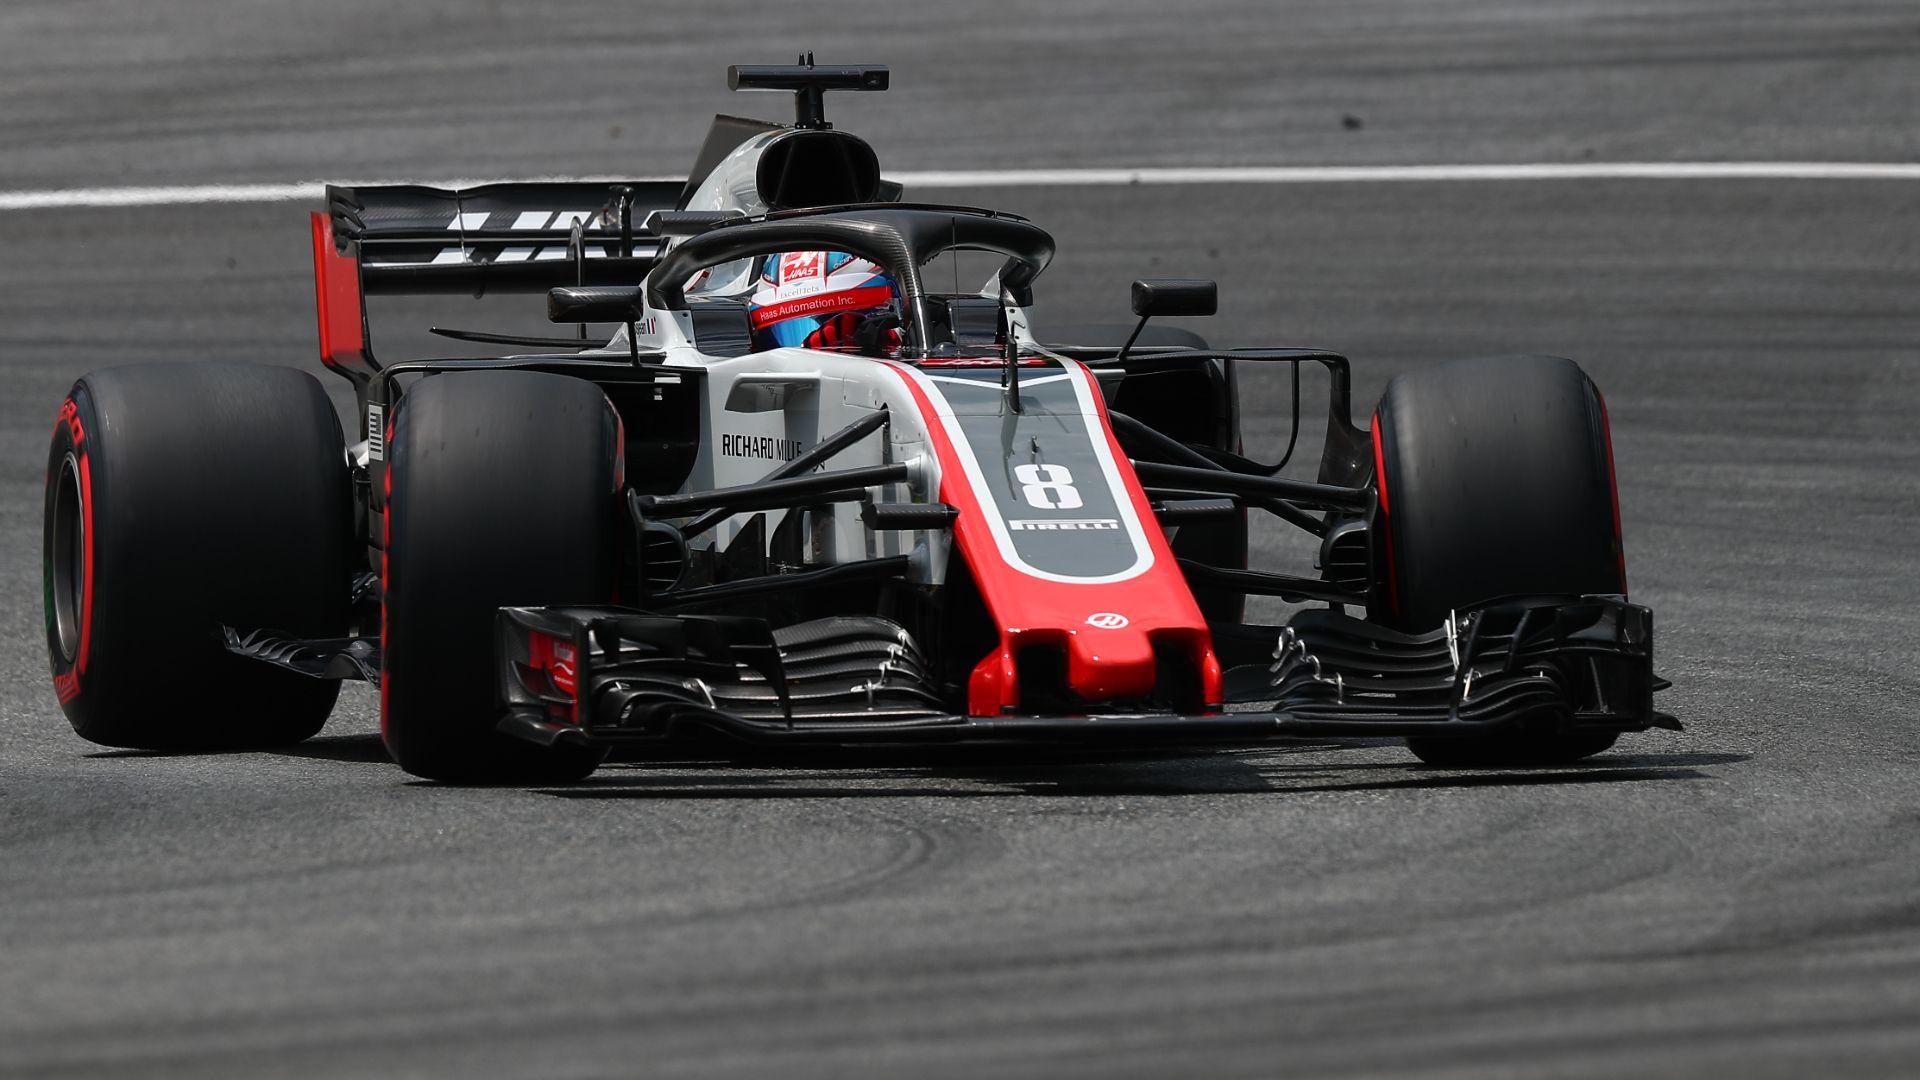 Haas puts the midfield on notice in Austria